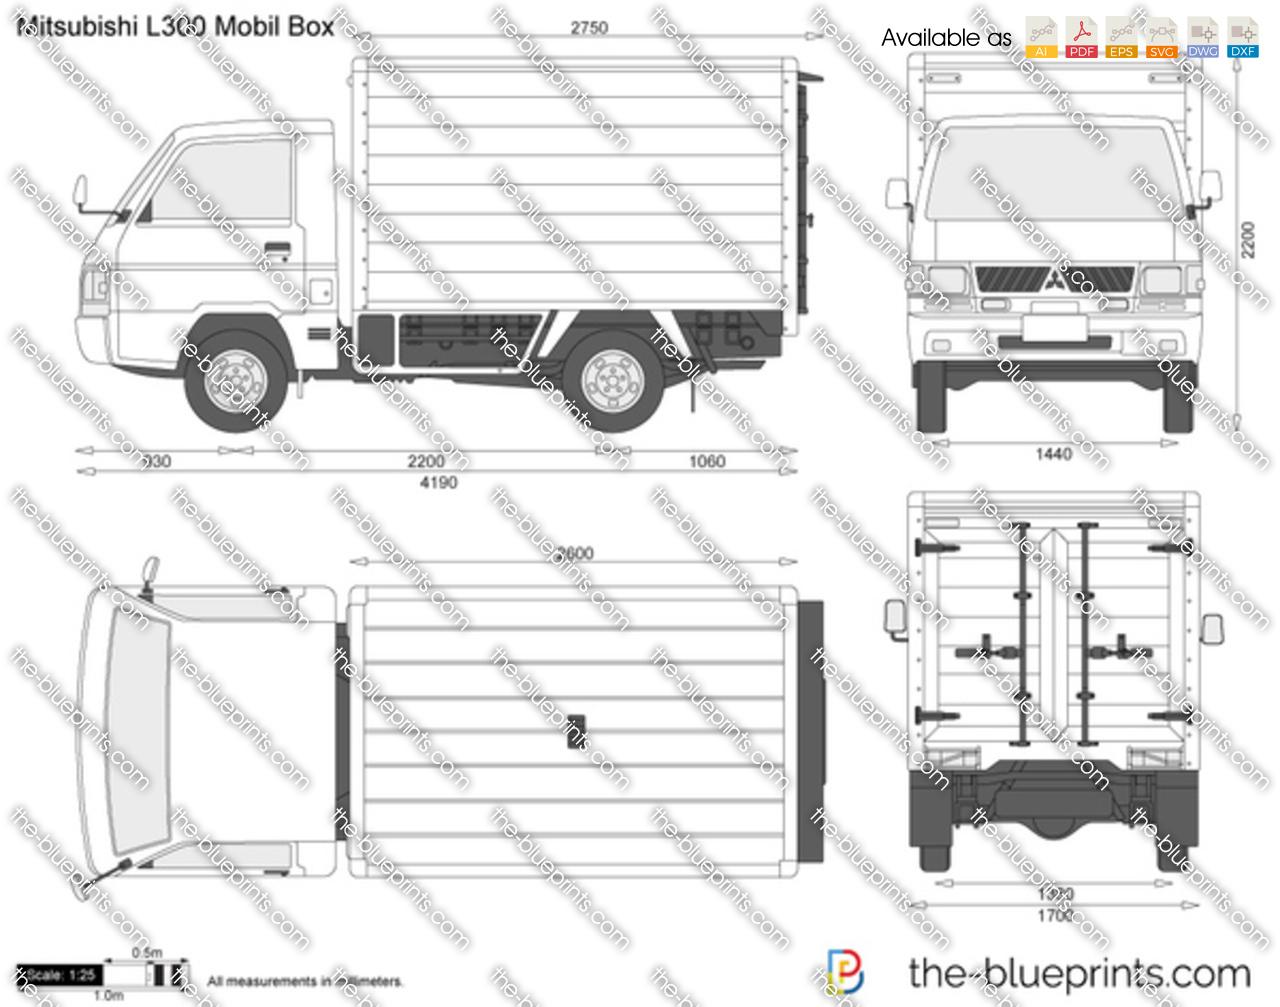 Mitsubishi L300 Mobil Box 1994